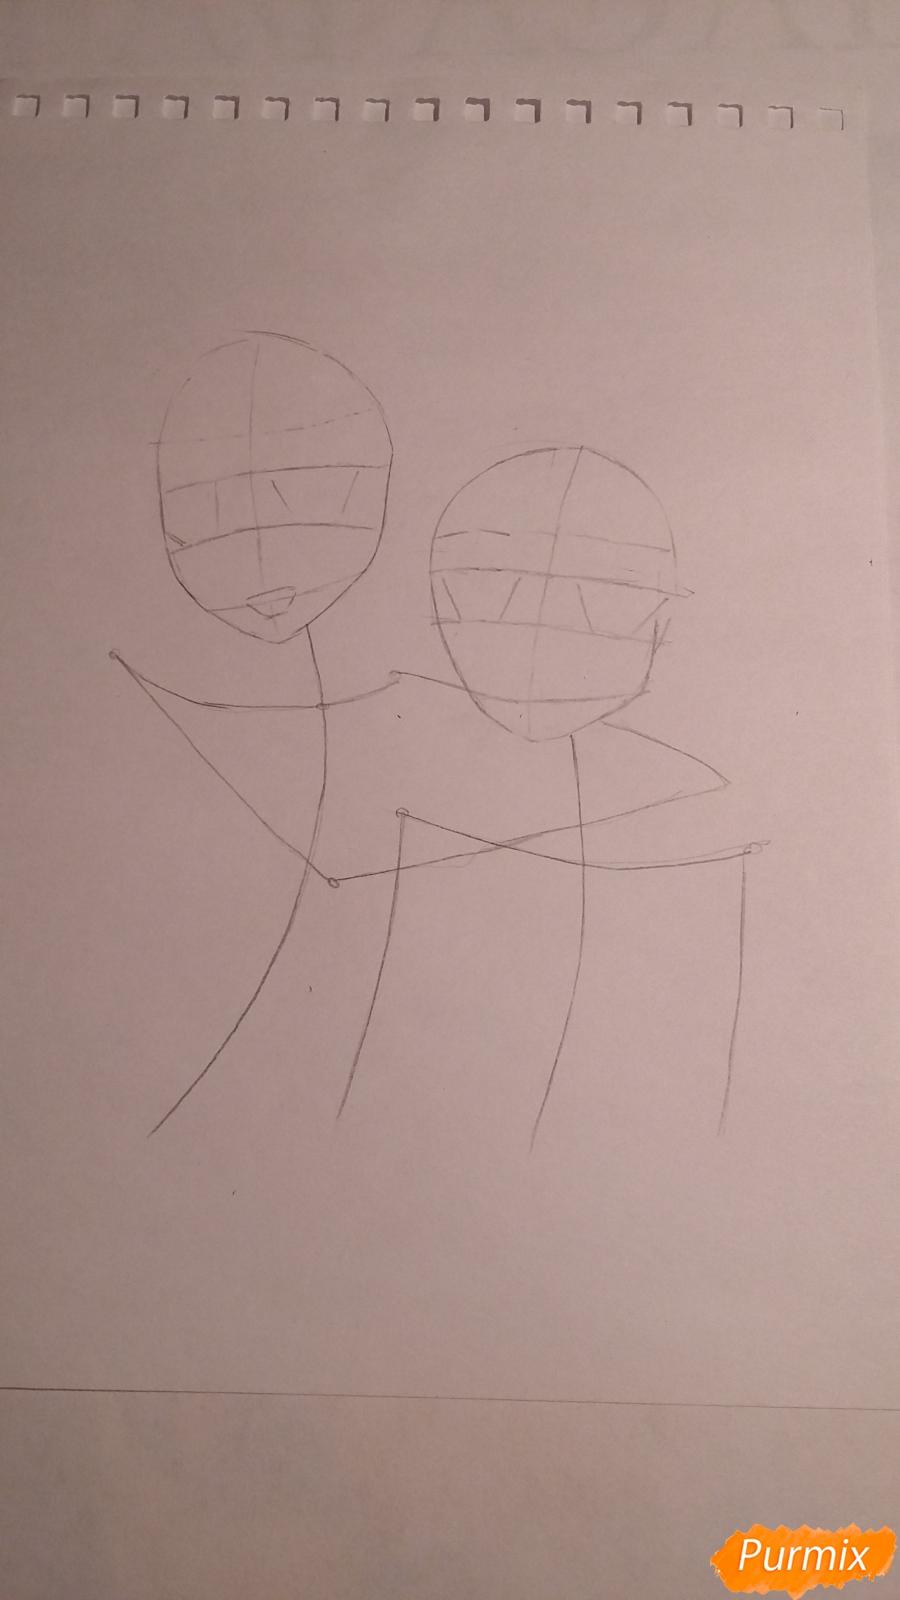 Рисуем двух девушек в аниме стиле - фото 1